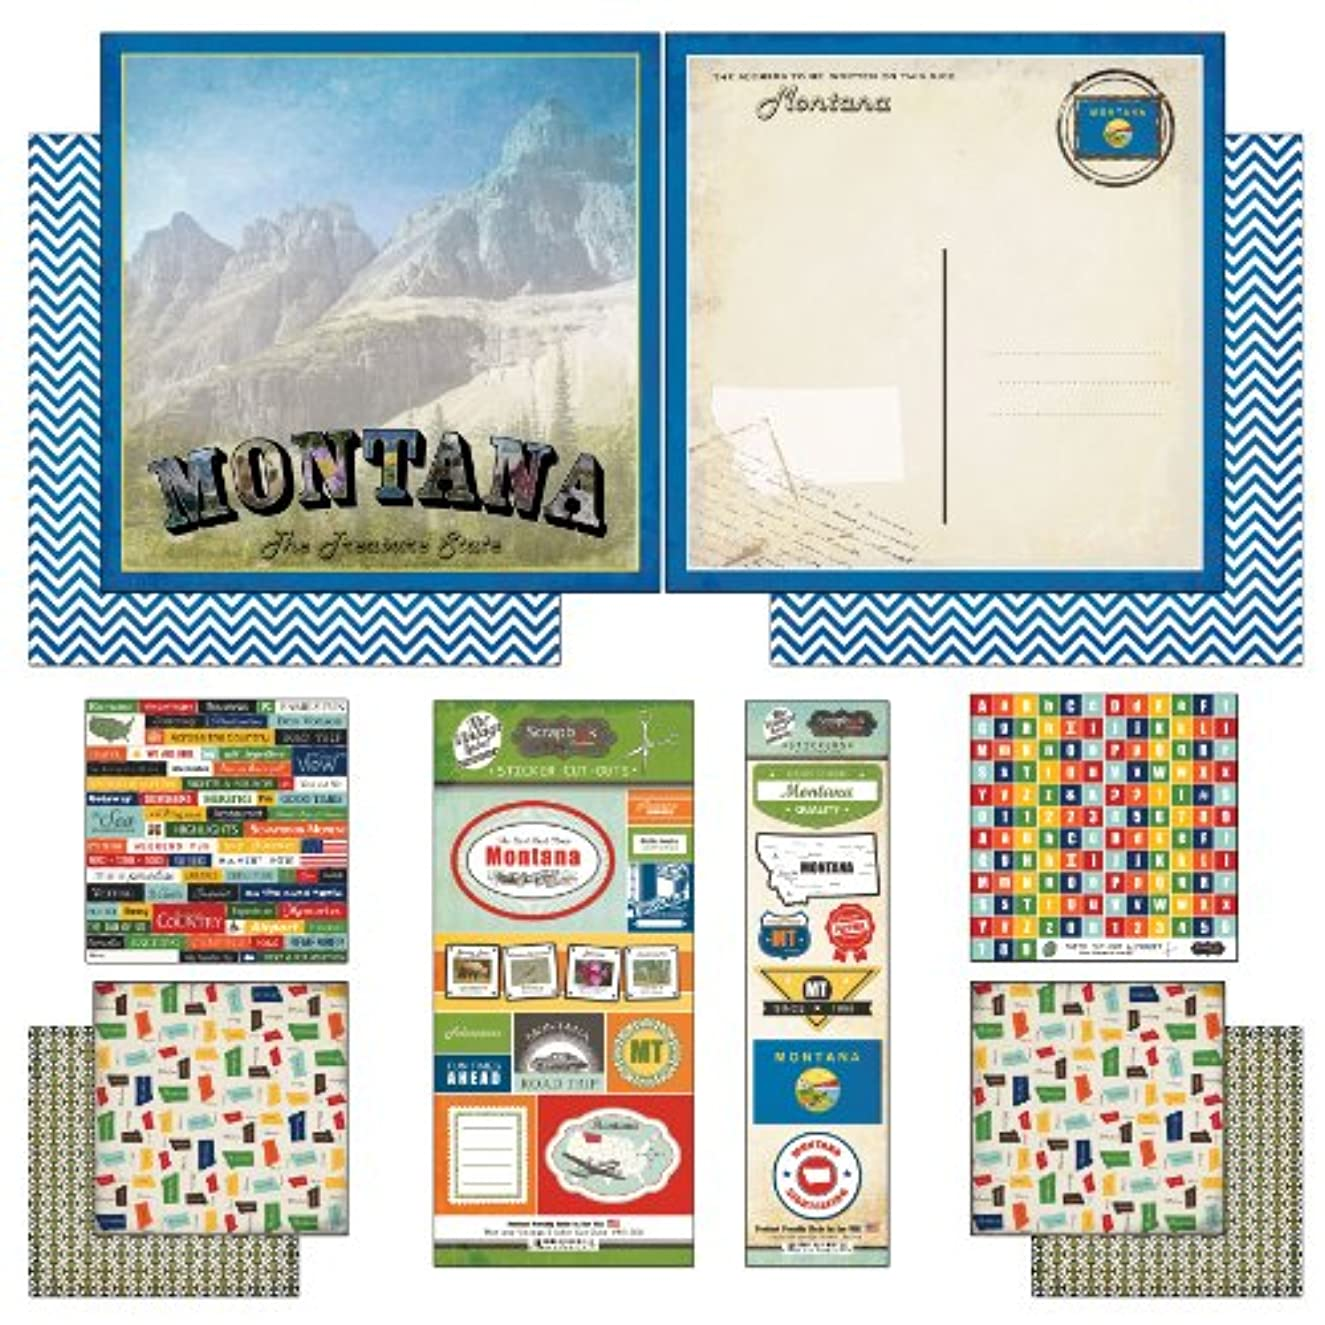 Scrapbook Customs Themed Paper and Stickers Scrapbook Kit, Montana Vintage